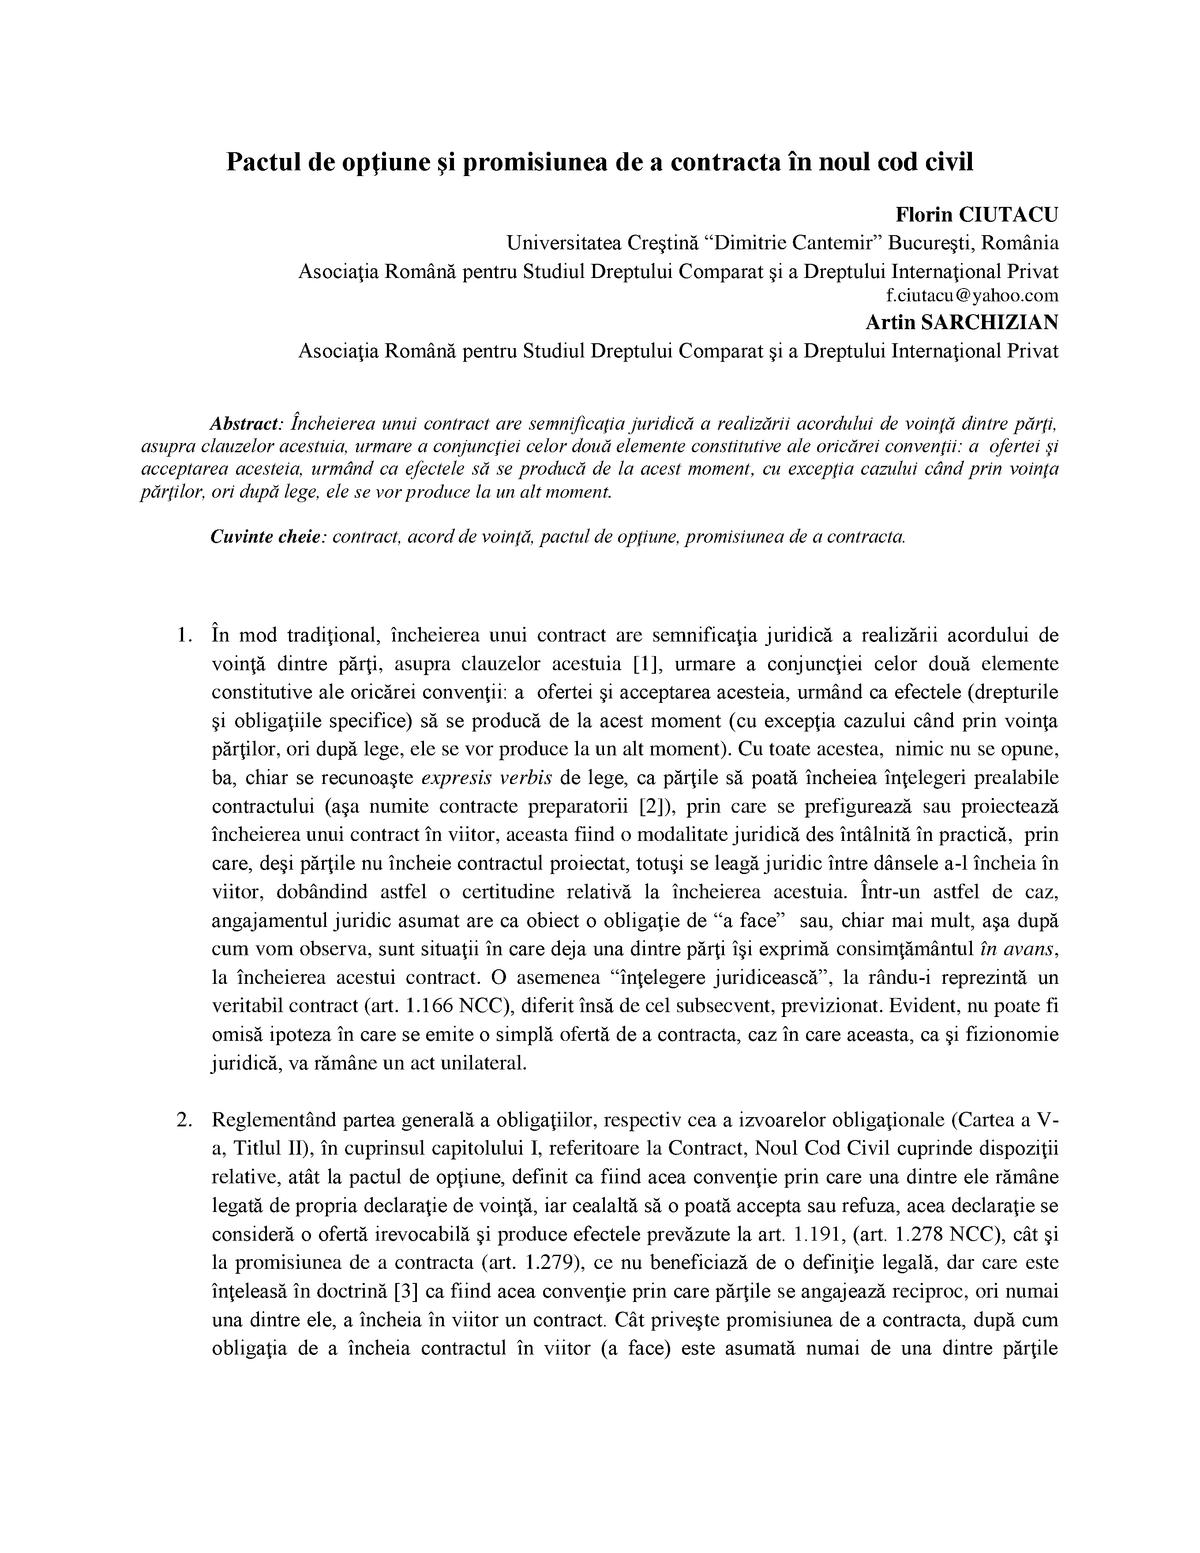 Pact de opțiune   Dictionar juridic (dex)